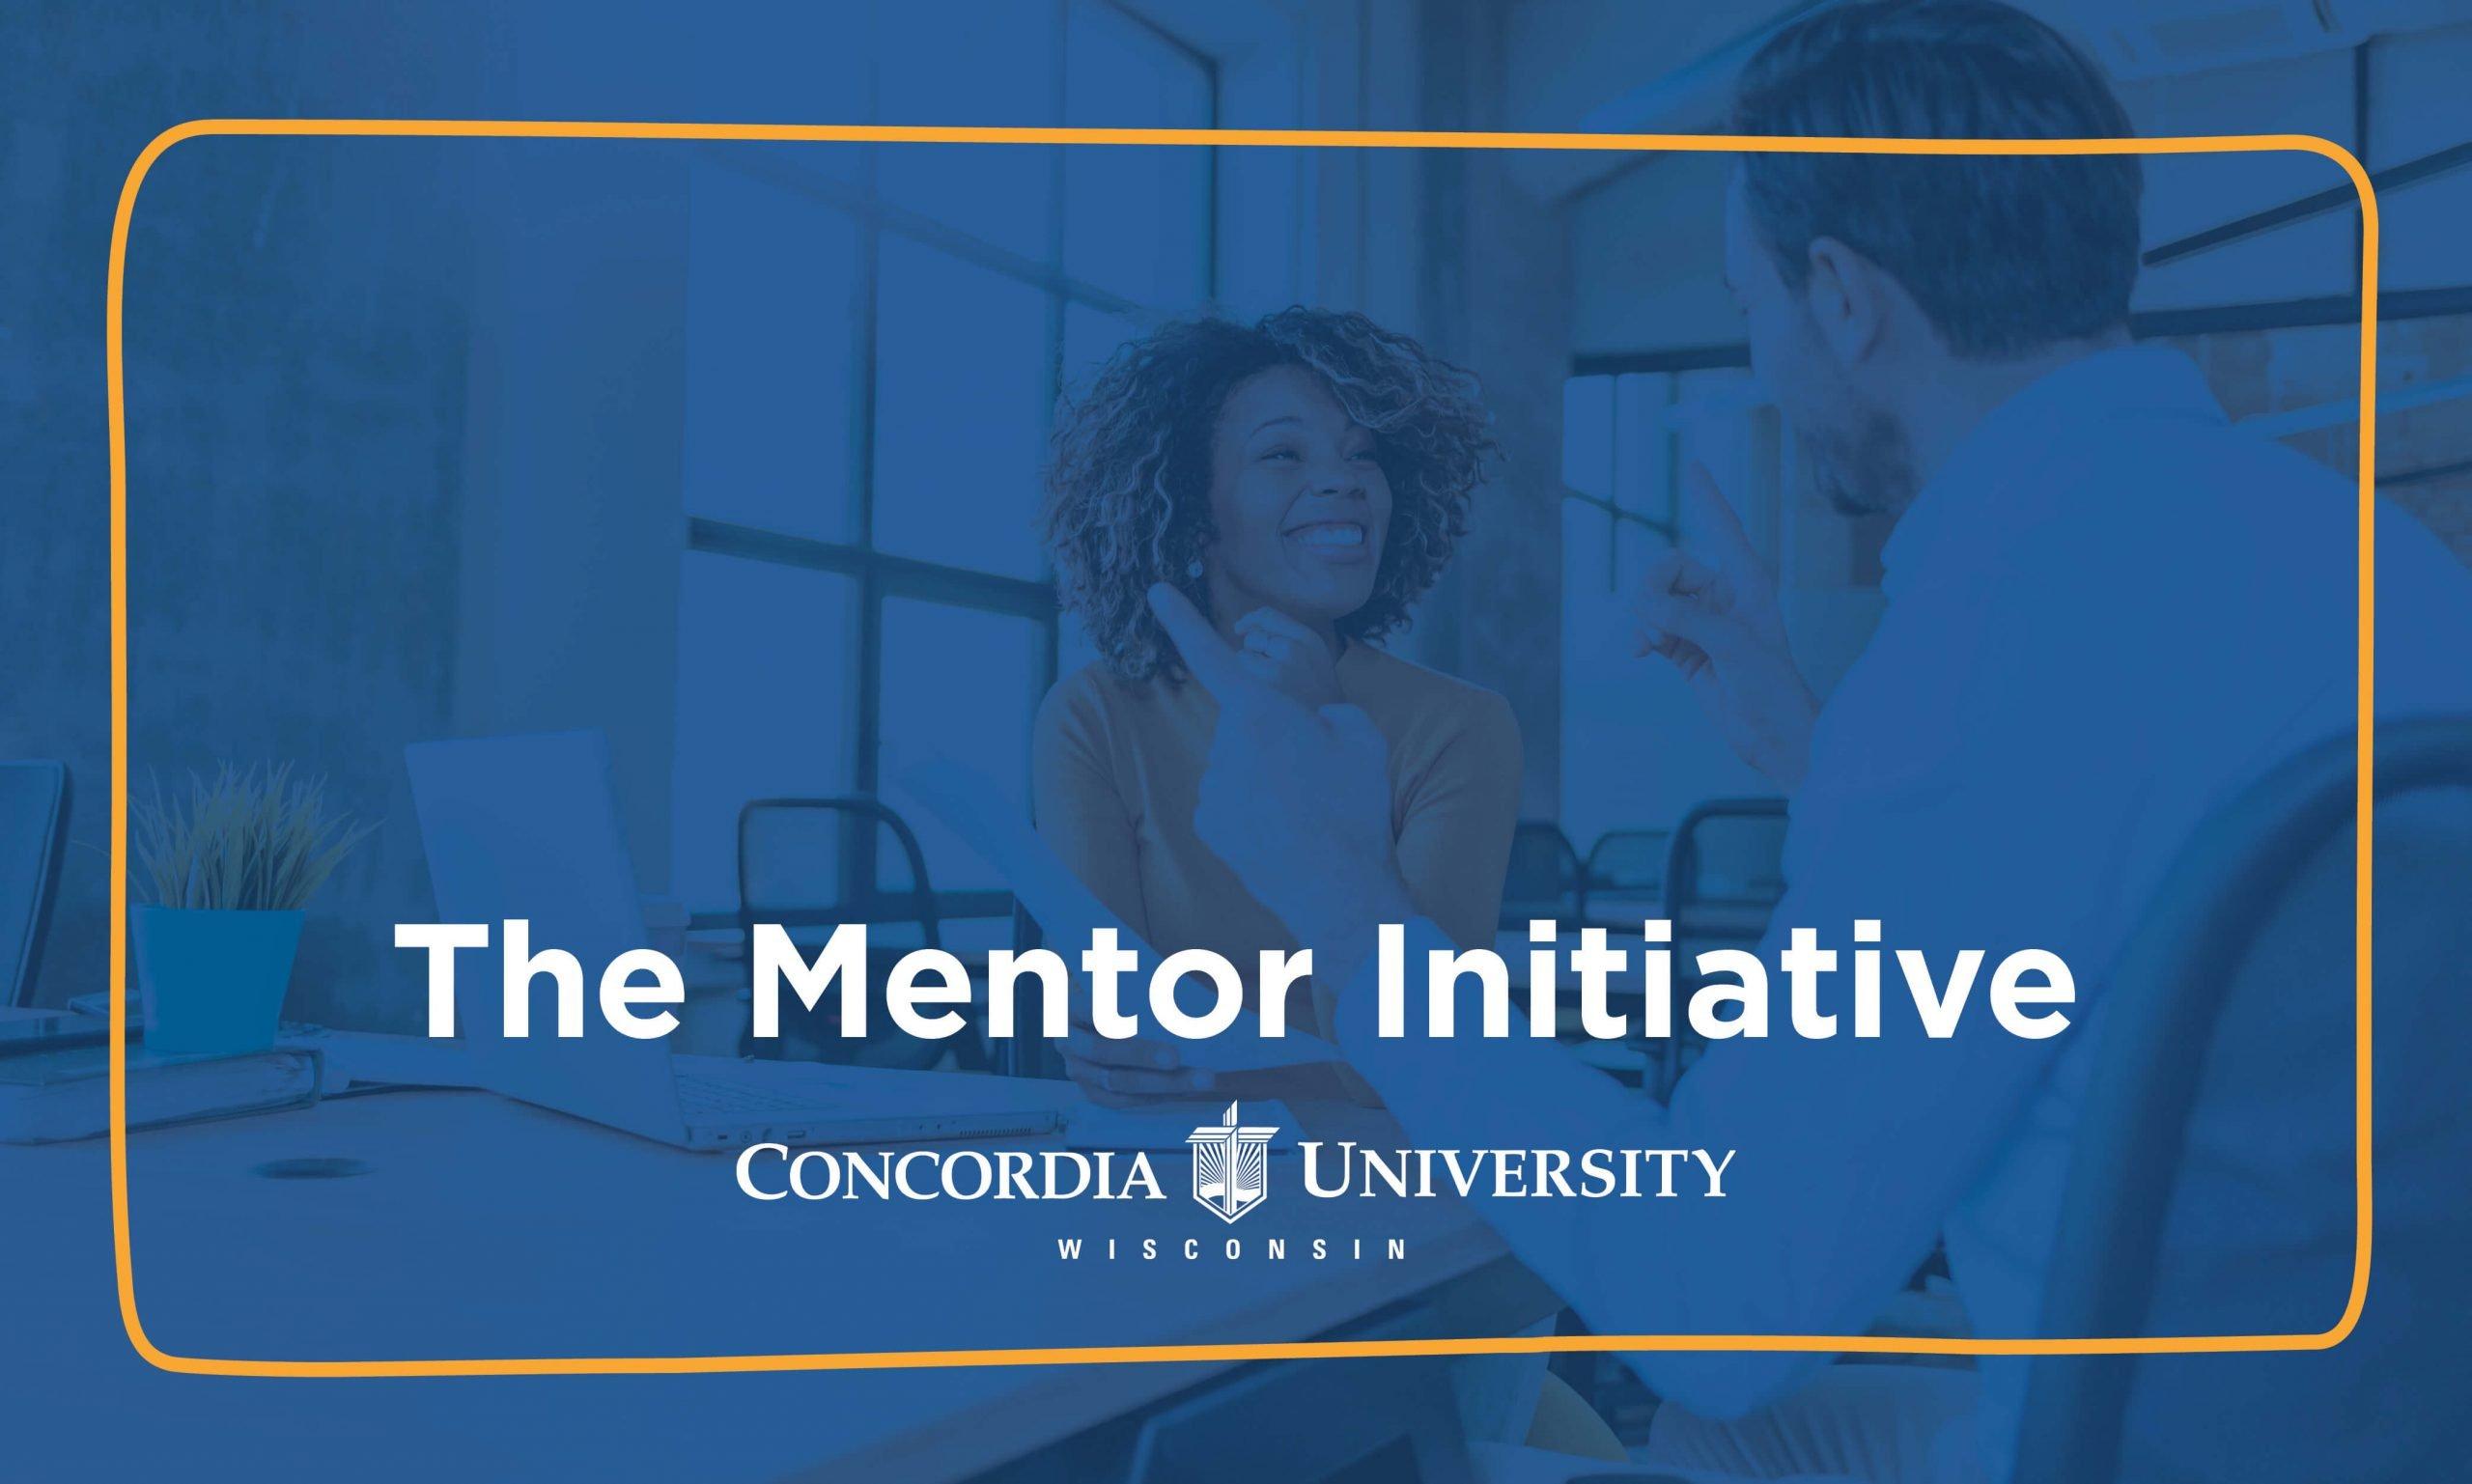 CUW The Mentor Initiative